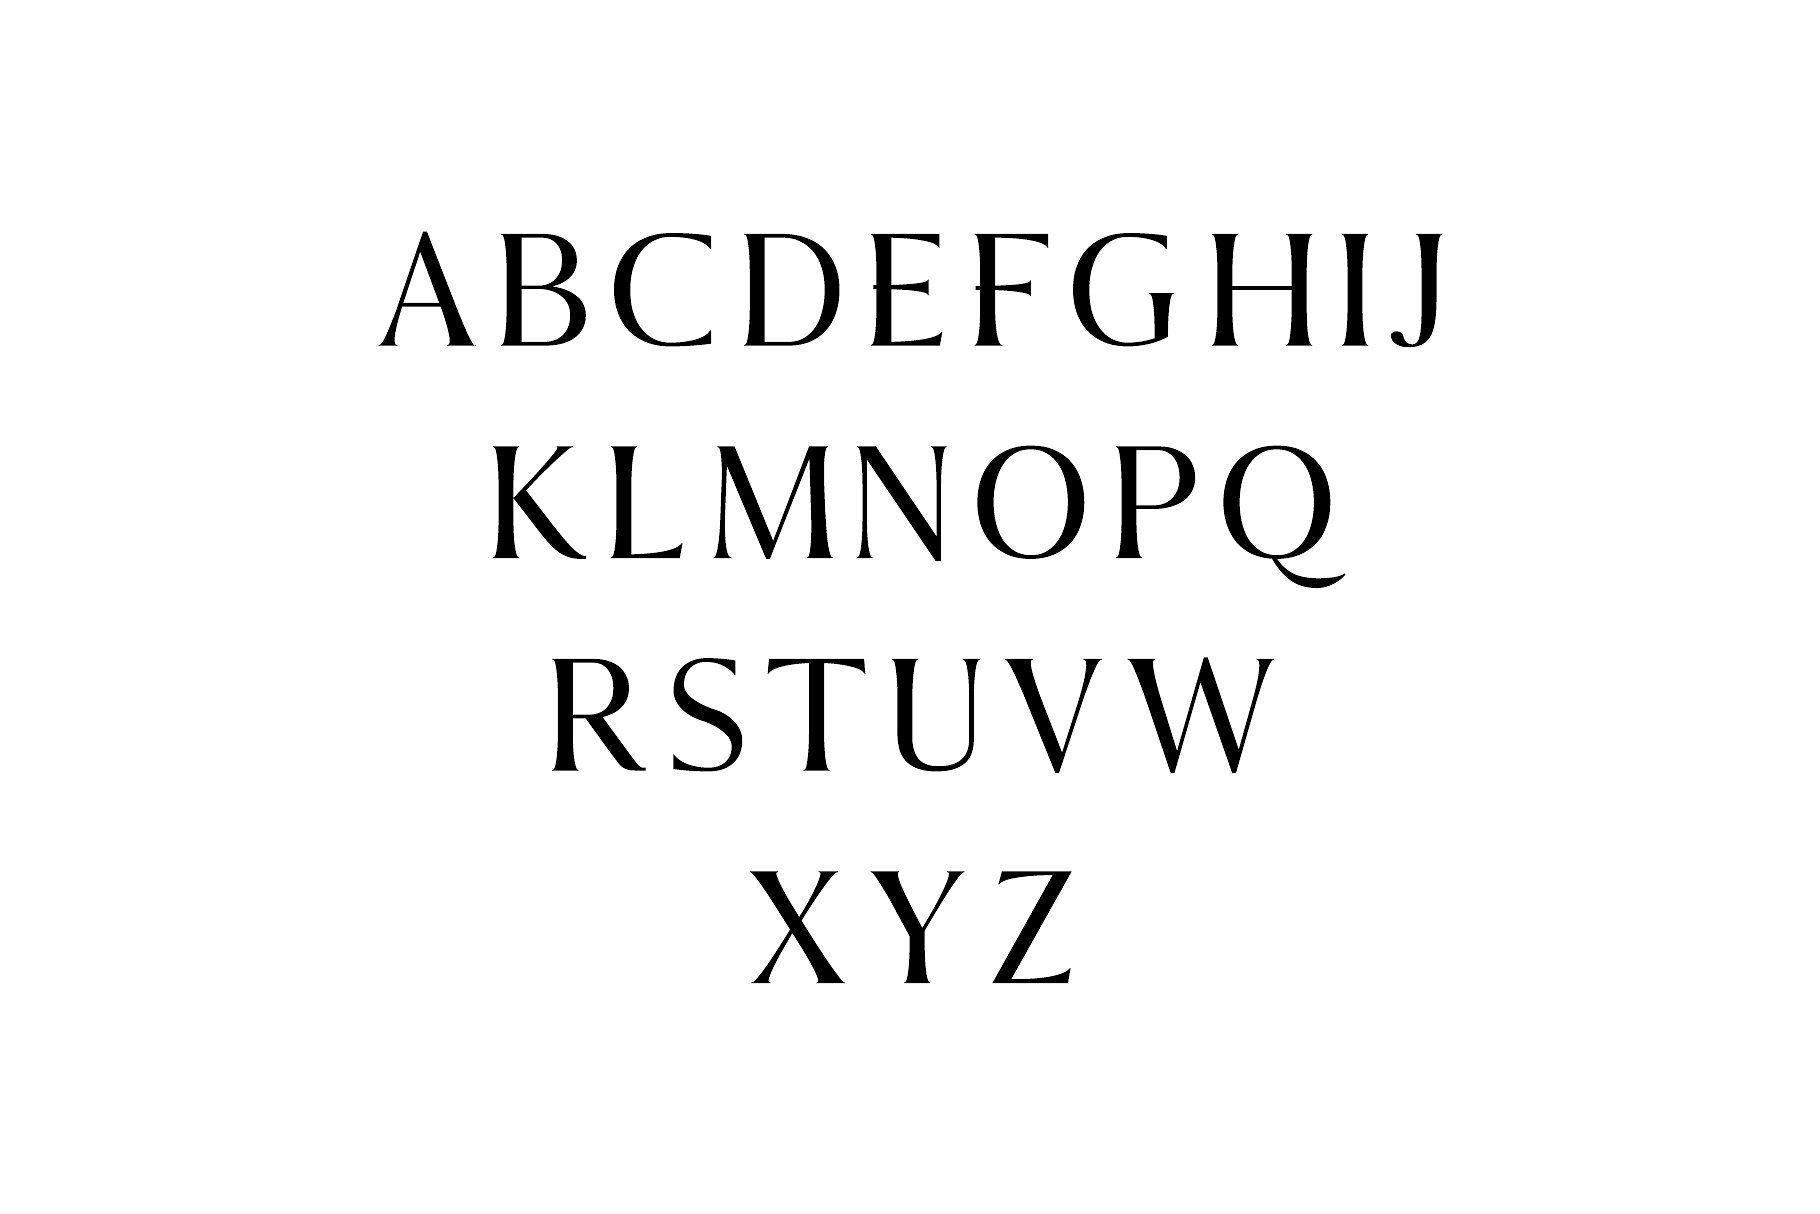 Sondra Serif 6 Fonts Family Pack #caps#scale#set#wide | Anime | Font